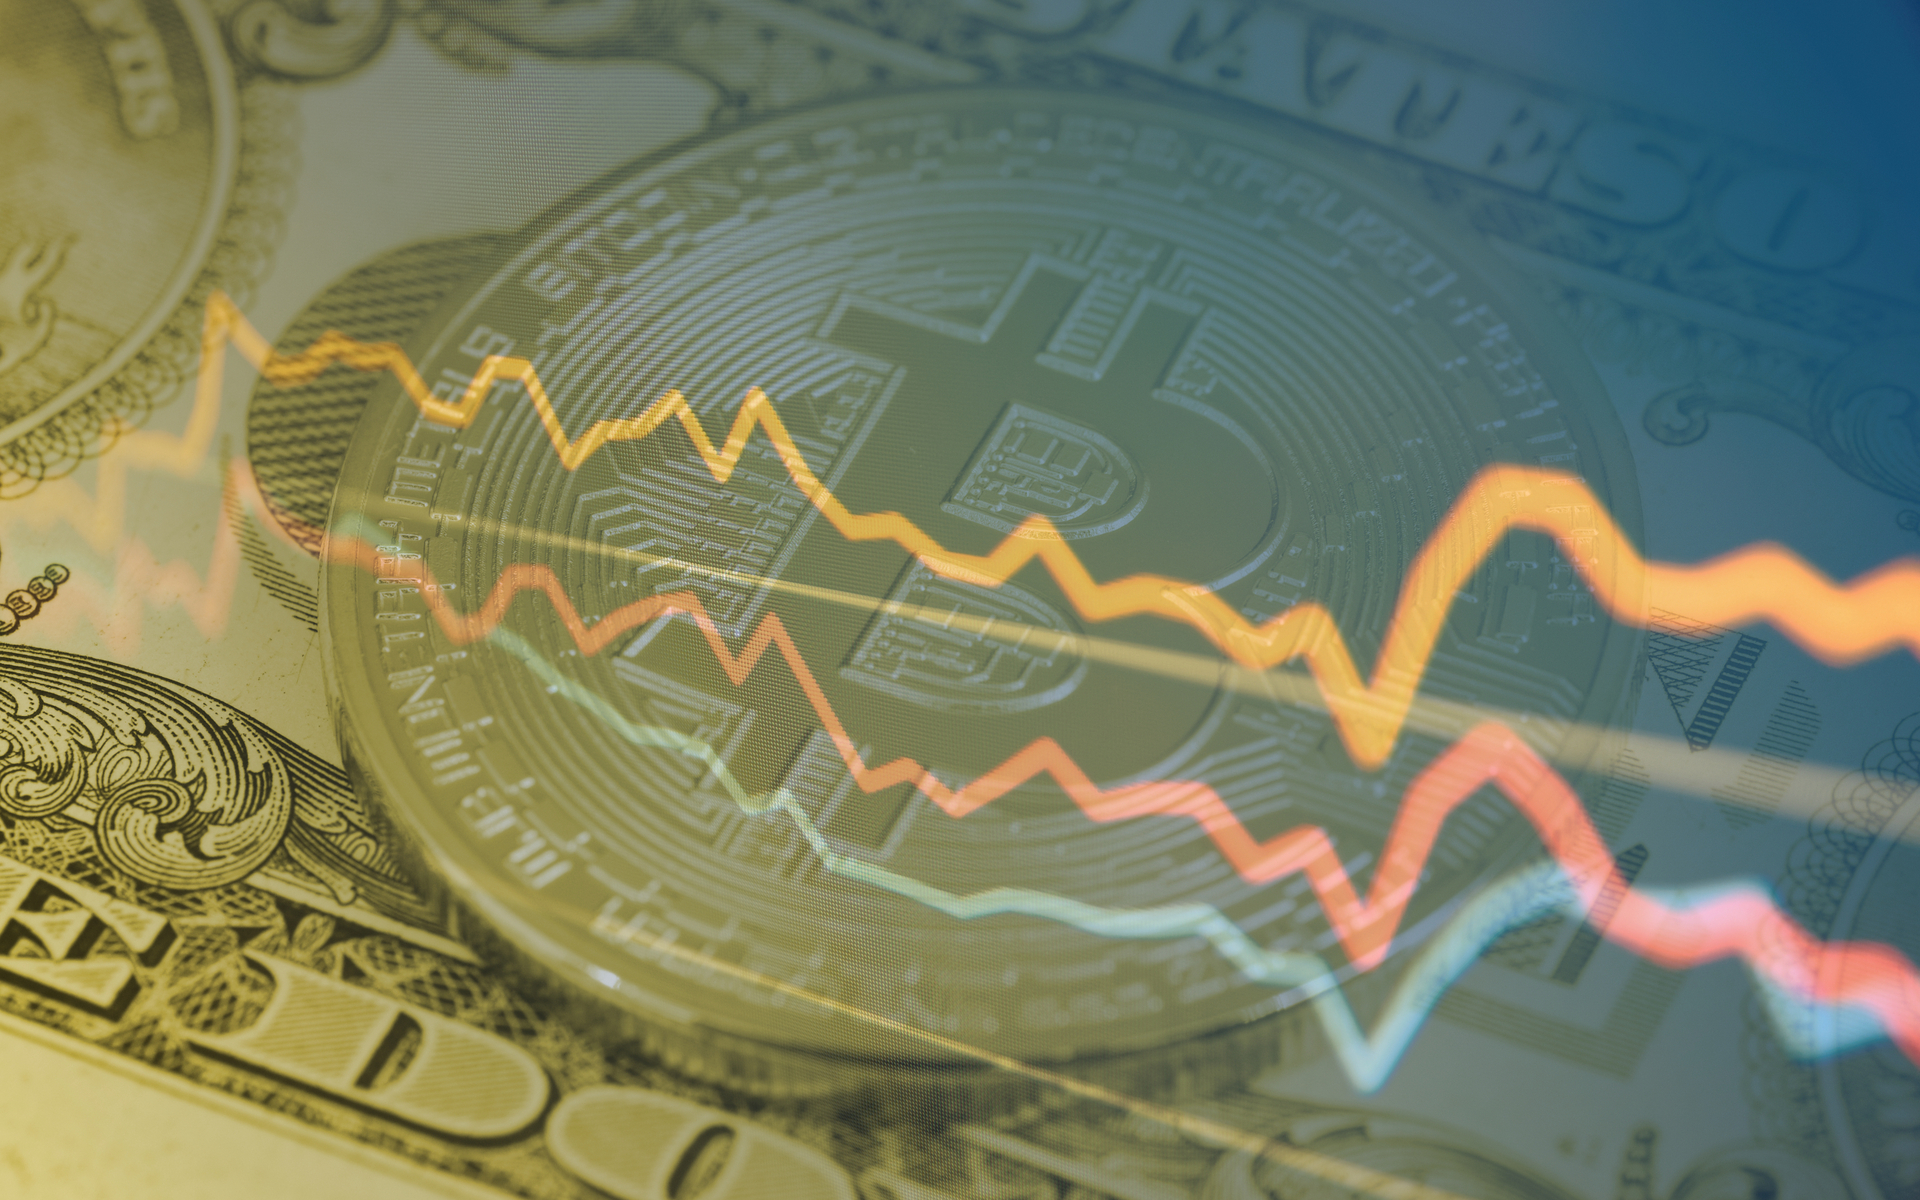 bitcoin btc s&p 500 alternative